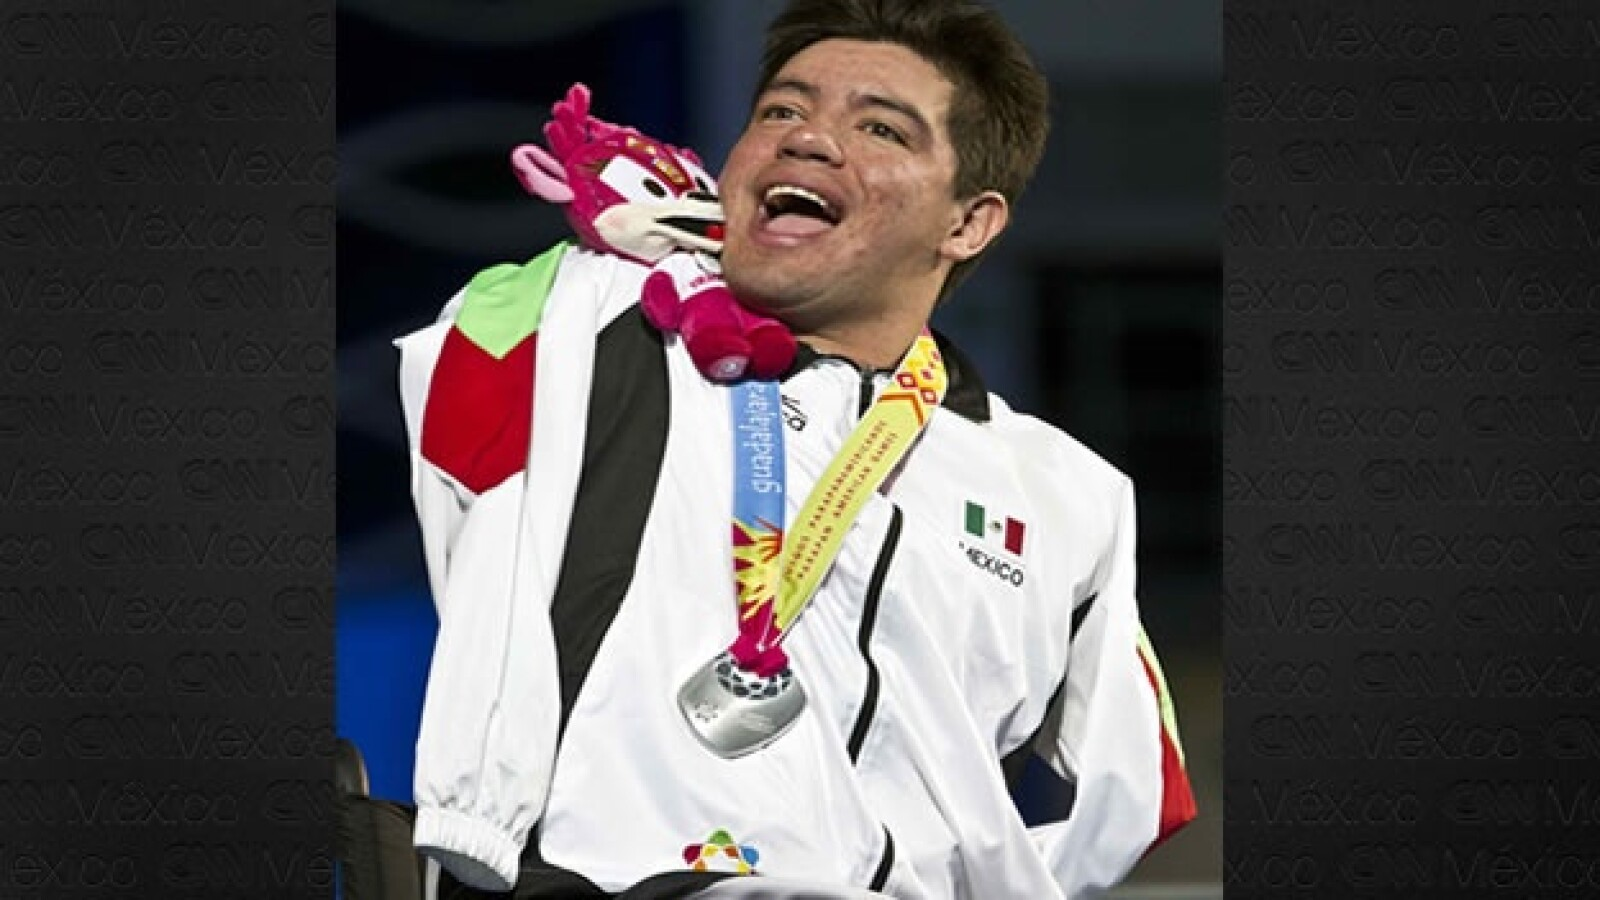 Juan Ignacio Reyes(